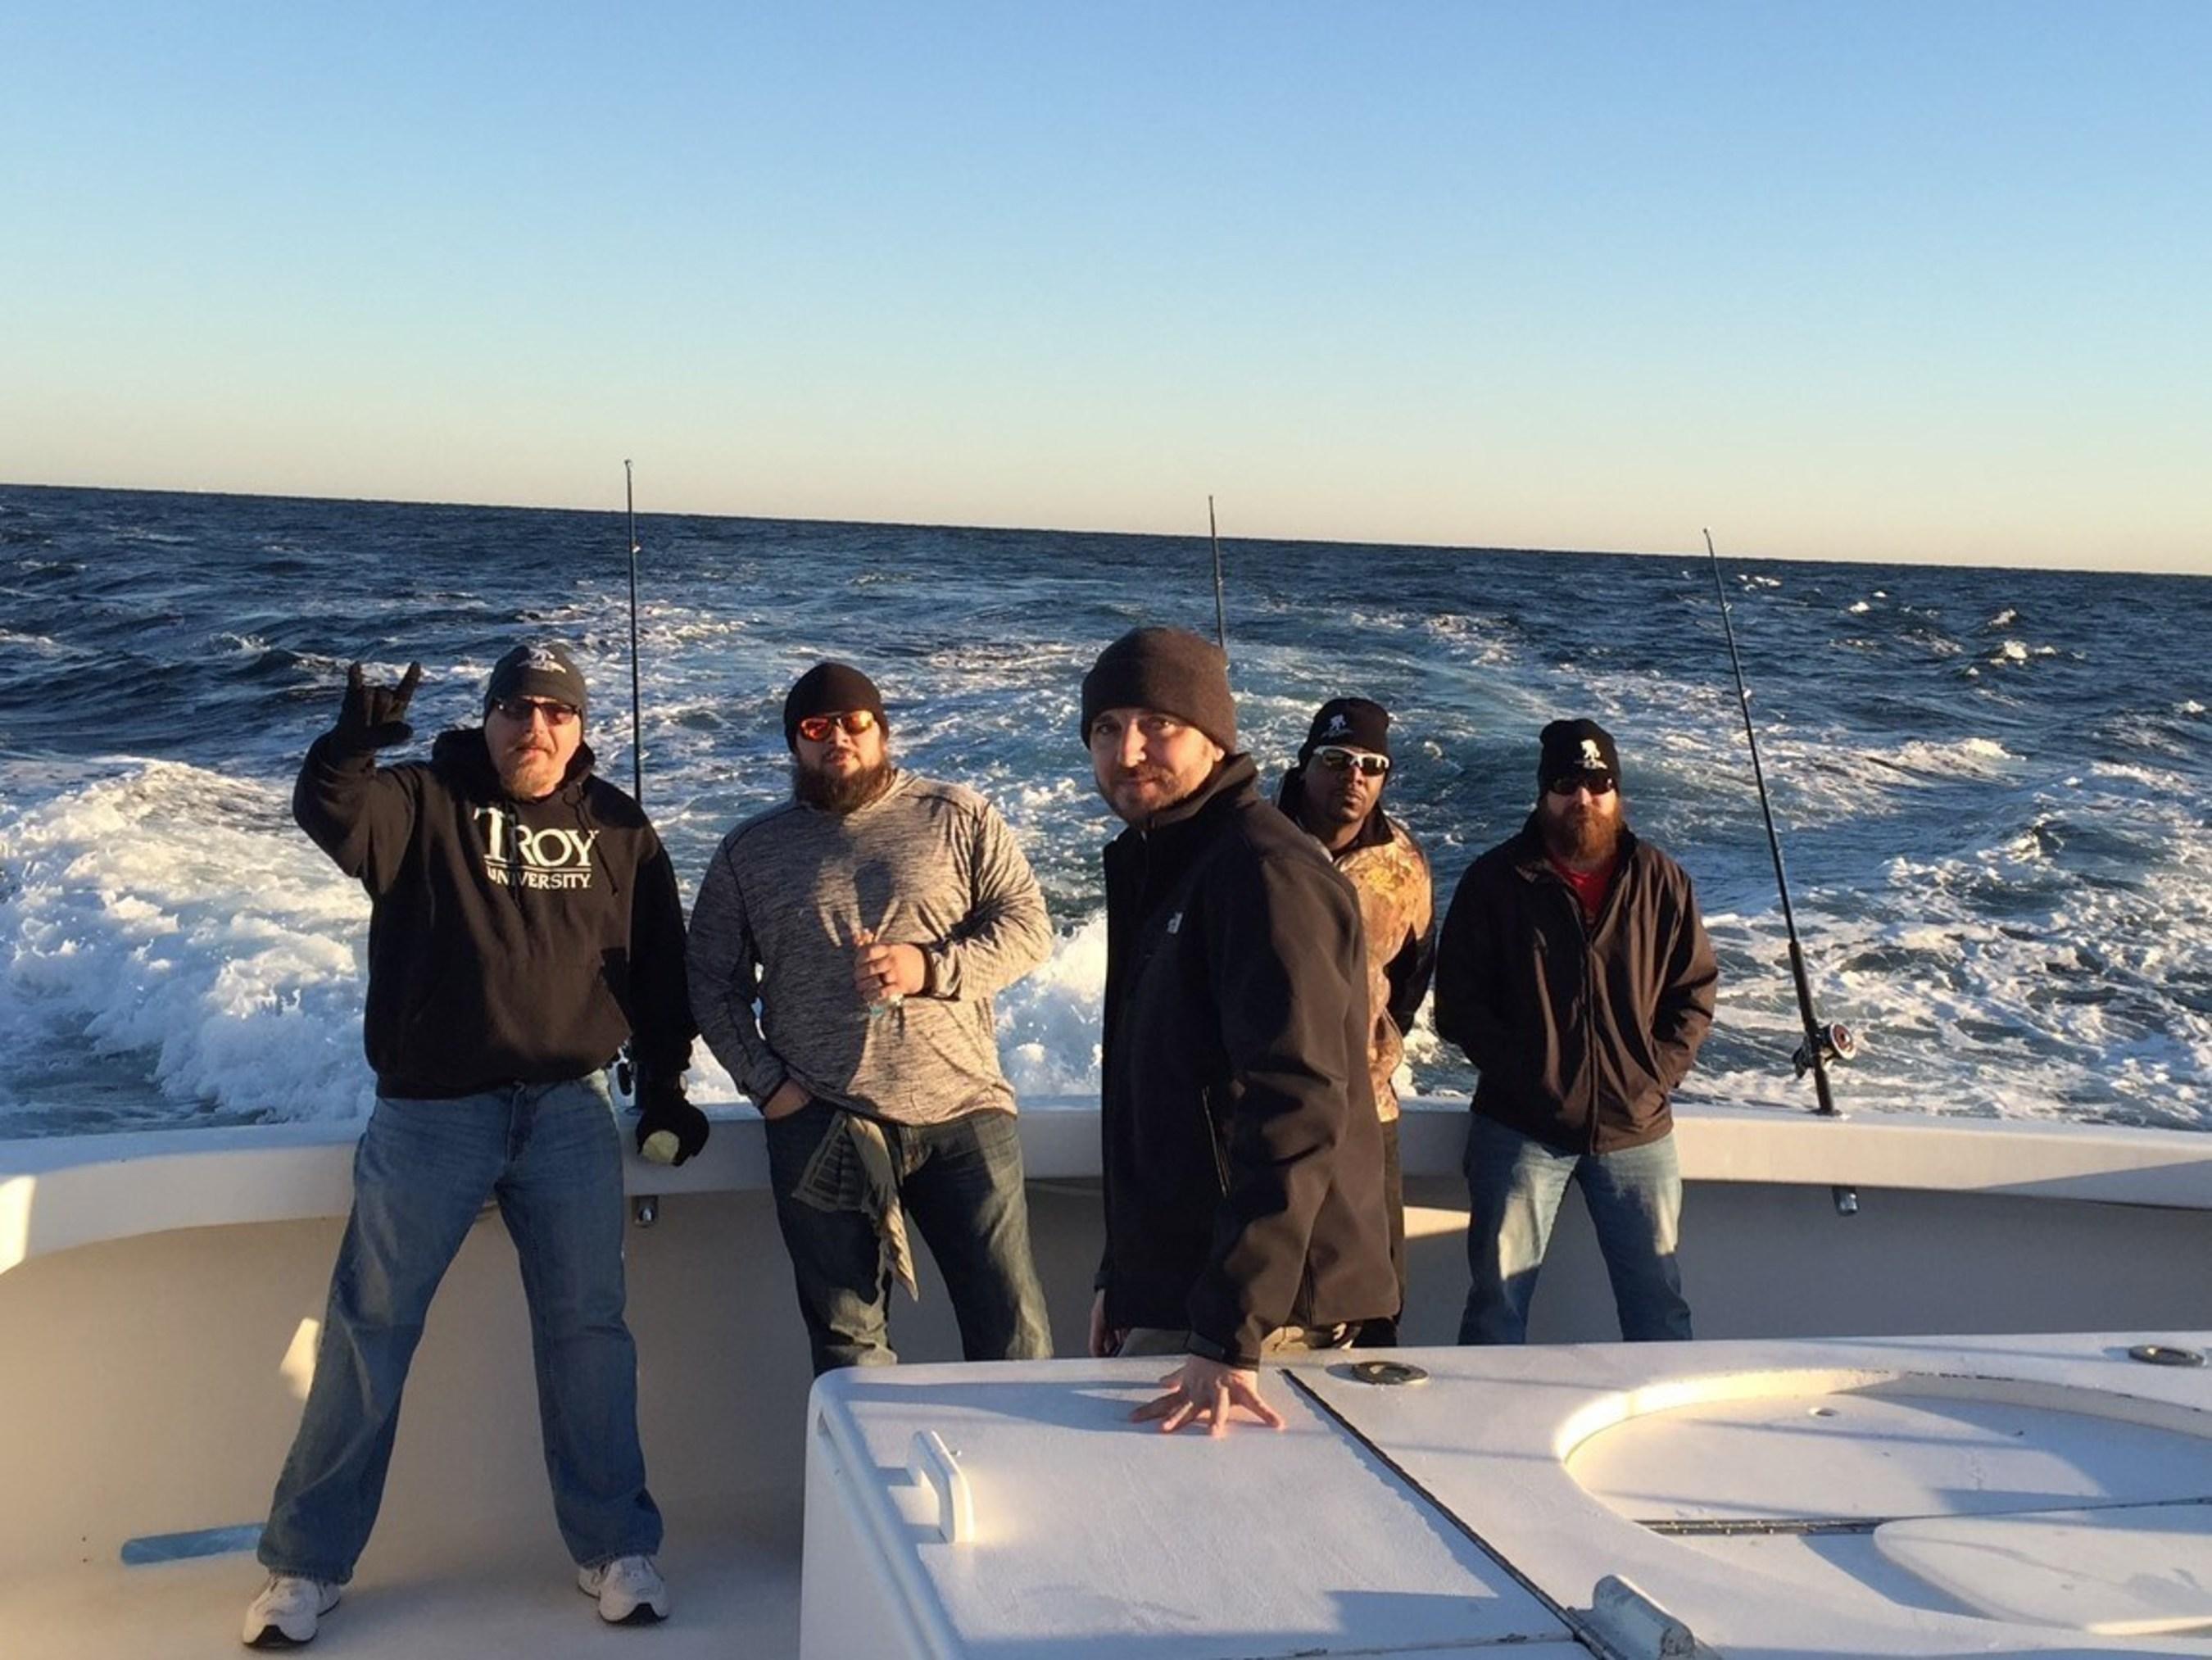 The three-day deep sea fishing trip was offered through the WWP Alumni program.